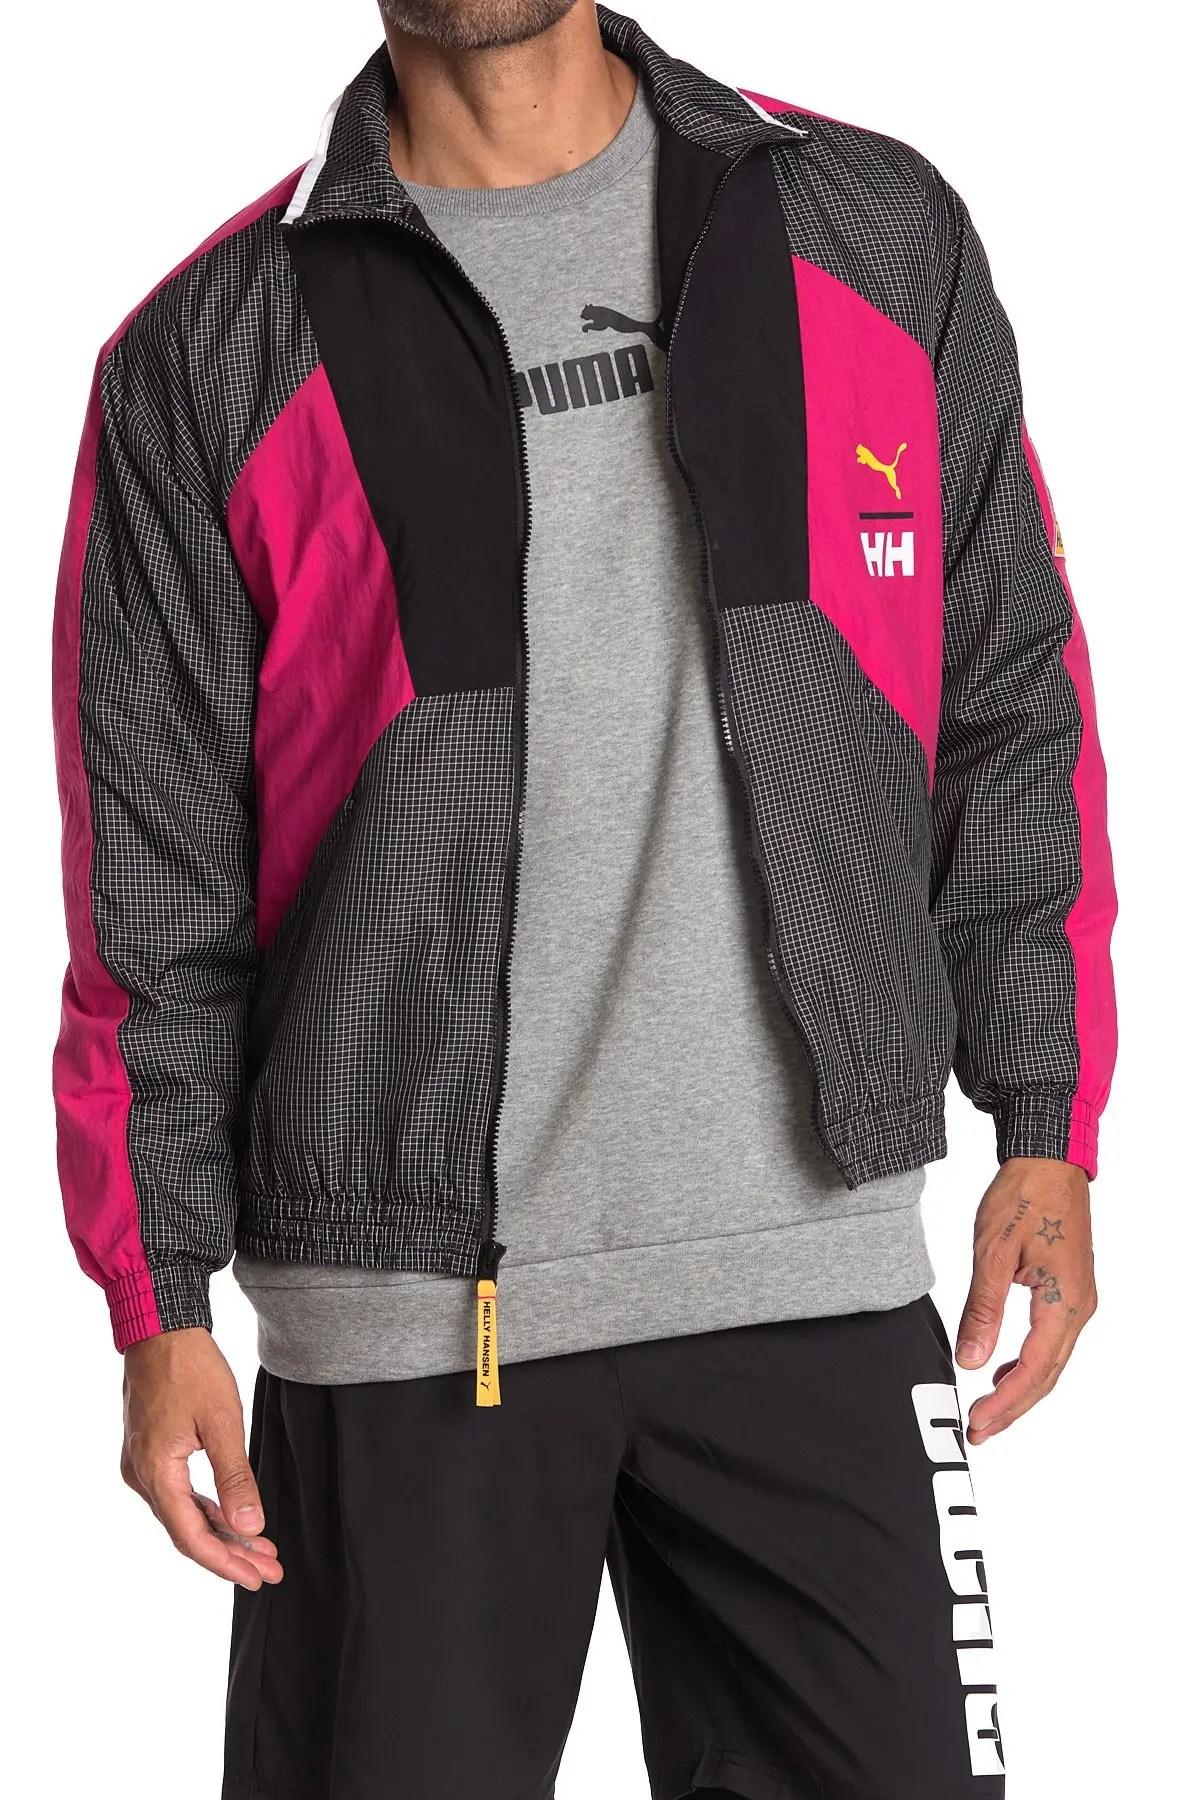 puma x helly hansen colorblock track jacket nordstrom rack